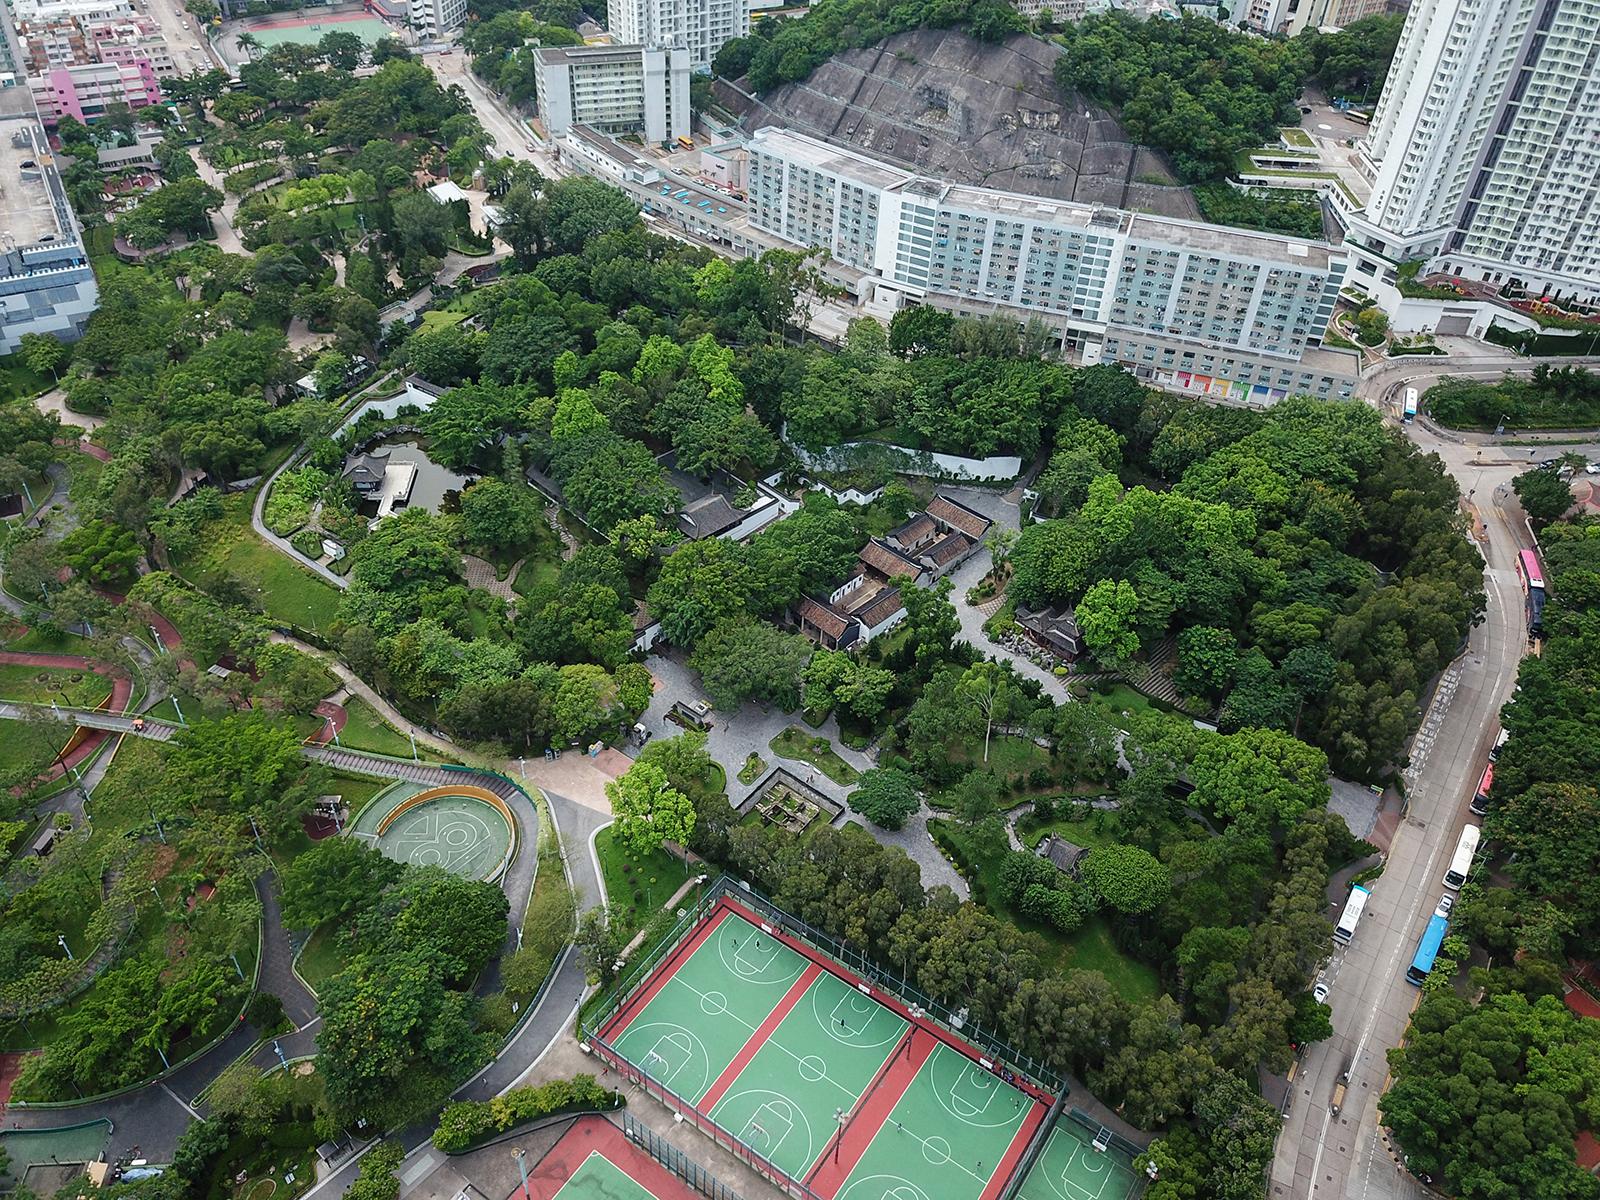 Kowloon Walled City Park aerial shot